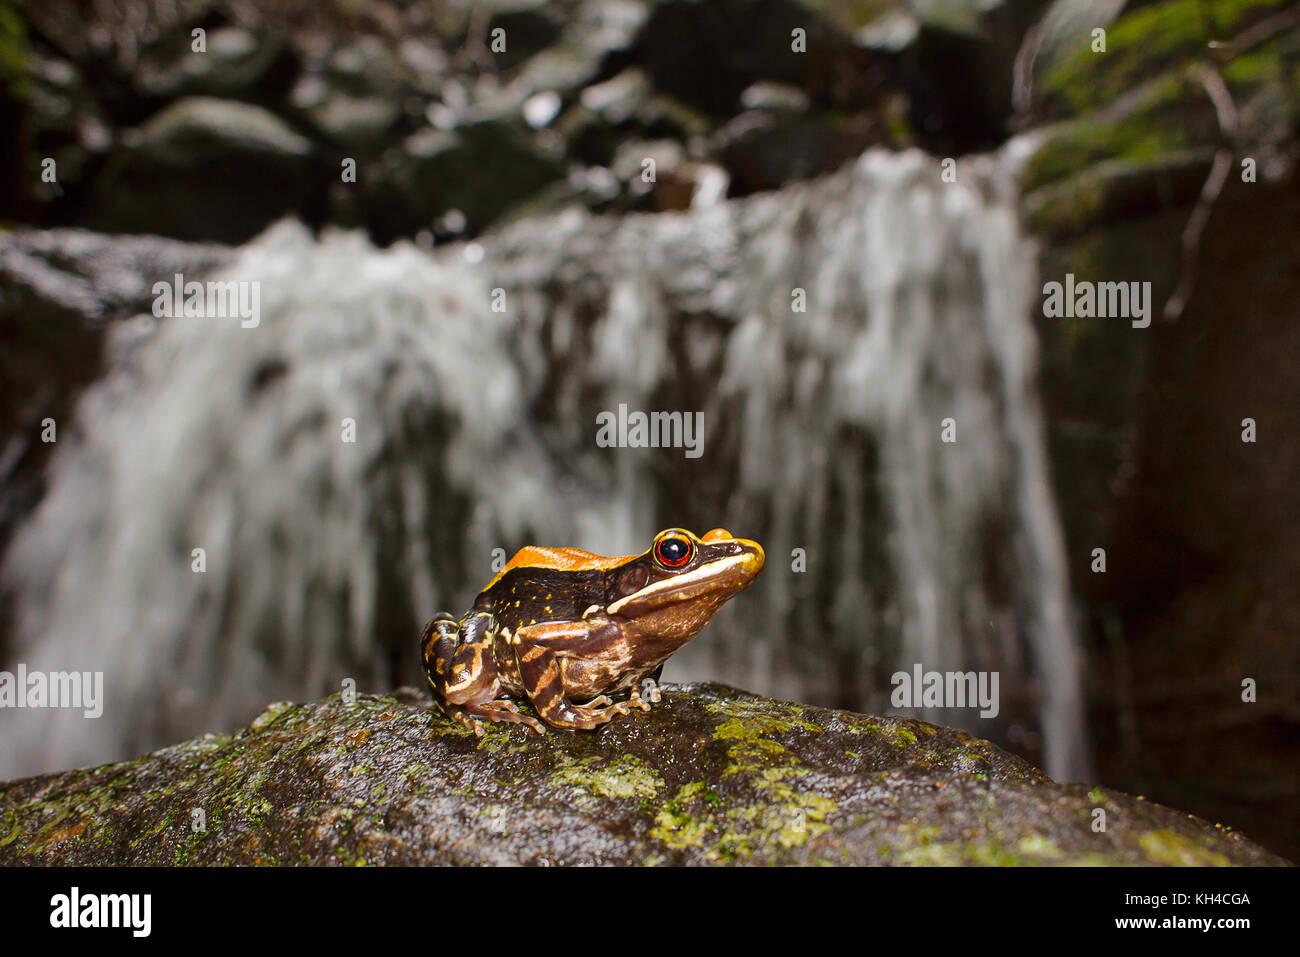 Fungoid Frog, Hylarana malabarica, habitat shot, Mulshi, Maharashtra - Stock Image